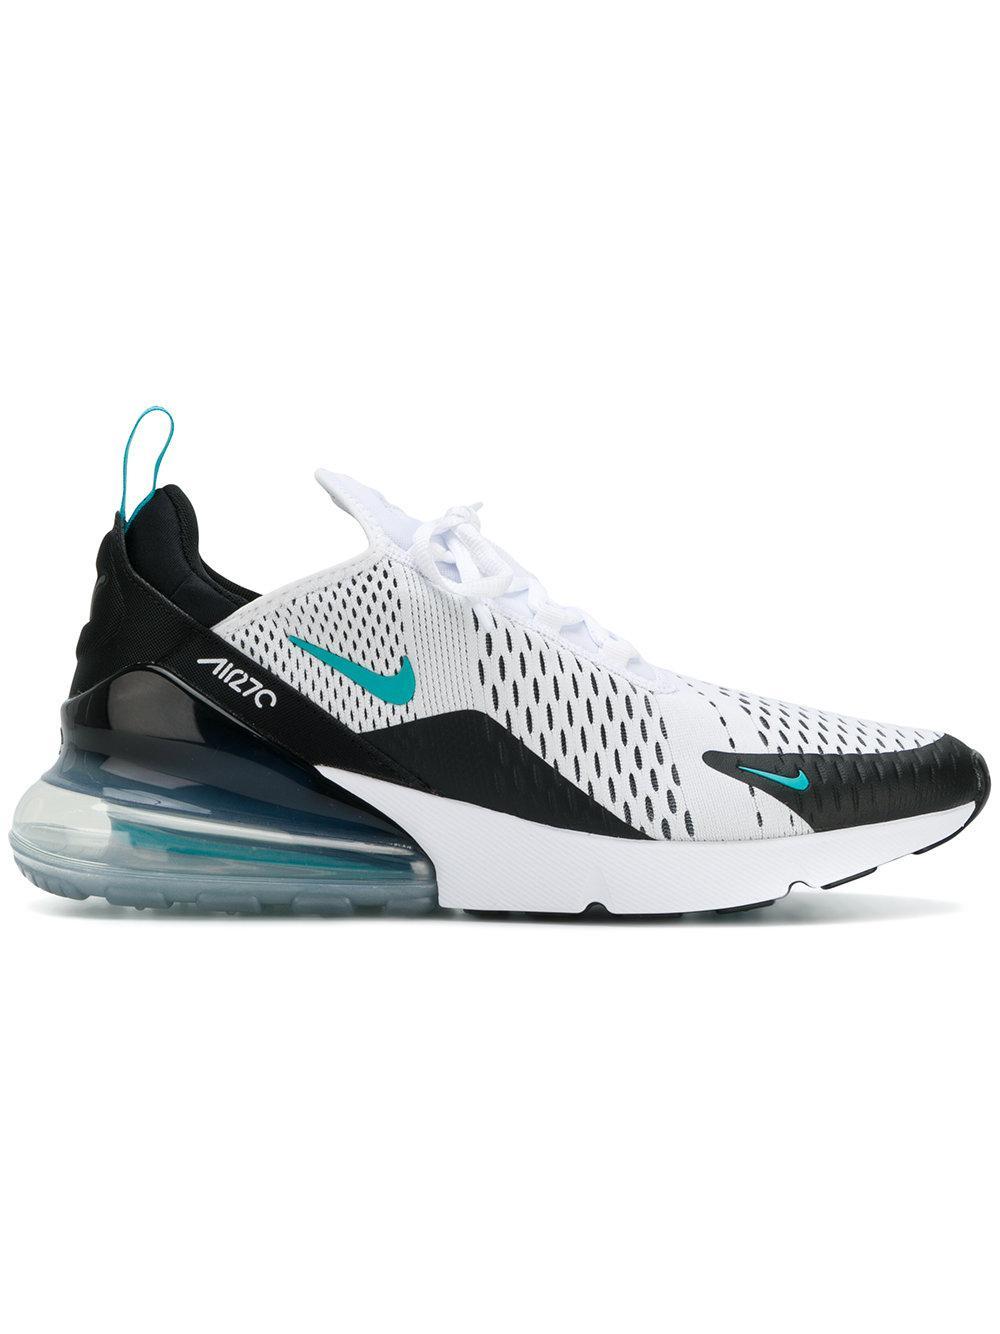 new styles 3de6f fbbb9 Nike Air Max 270 Sneakers - Black